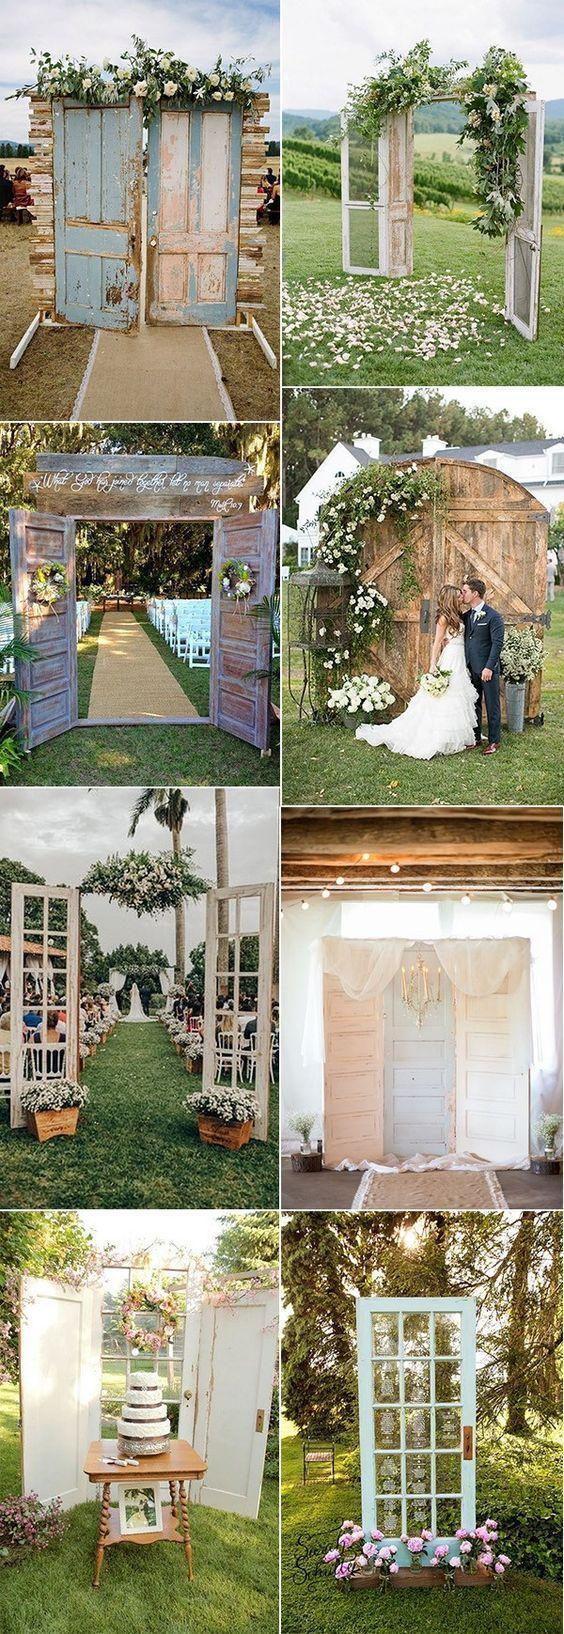 100+rustic wedding ideasdiy country outdoor wedding